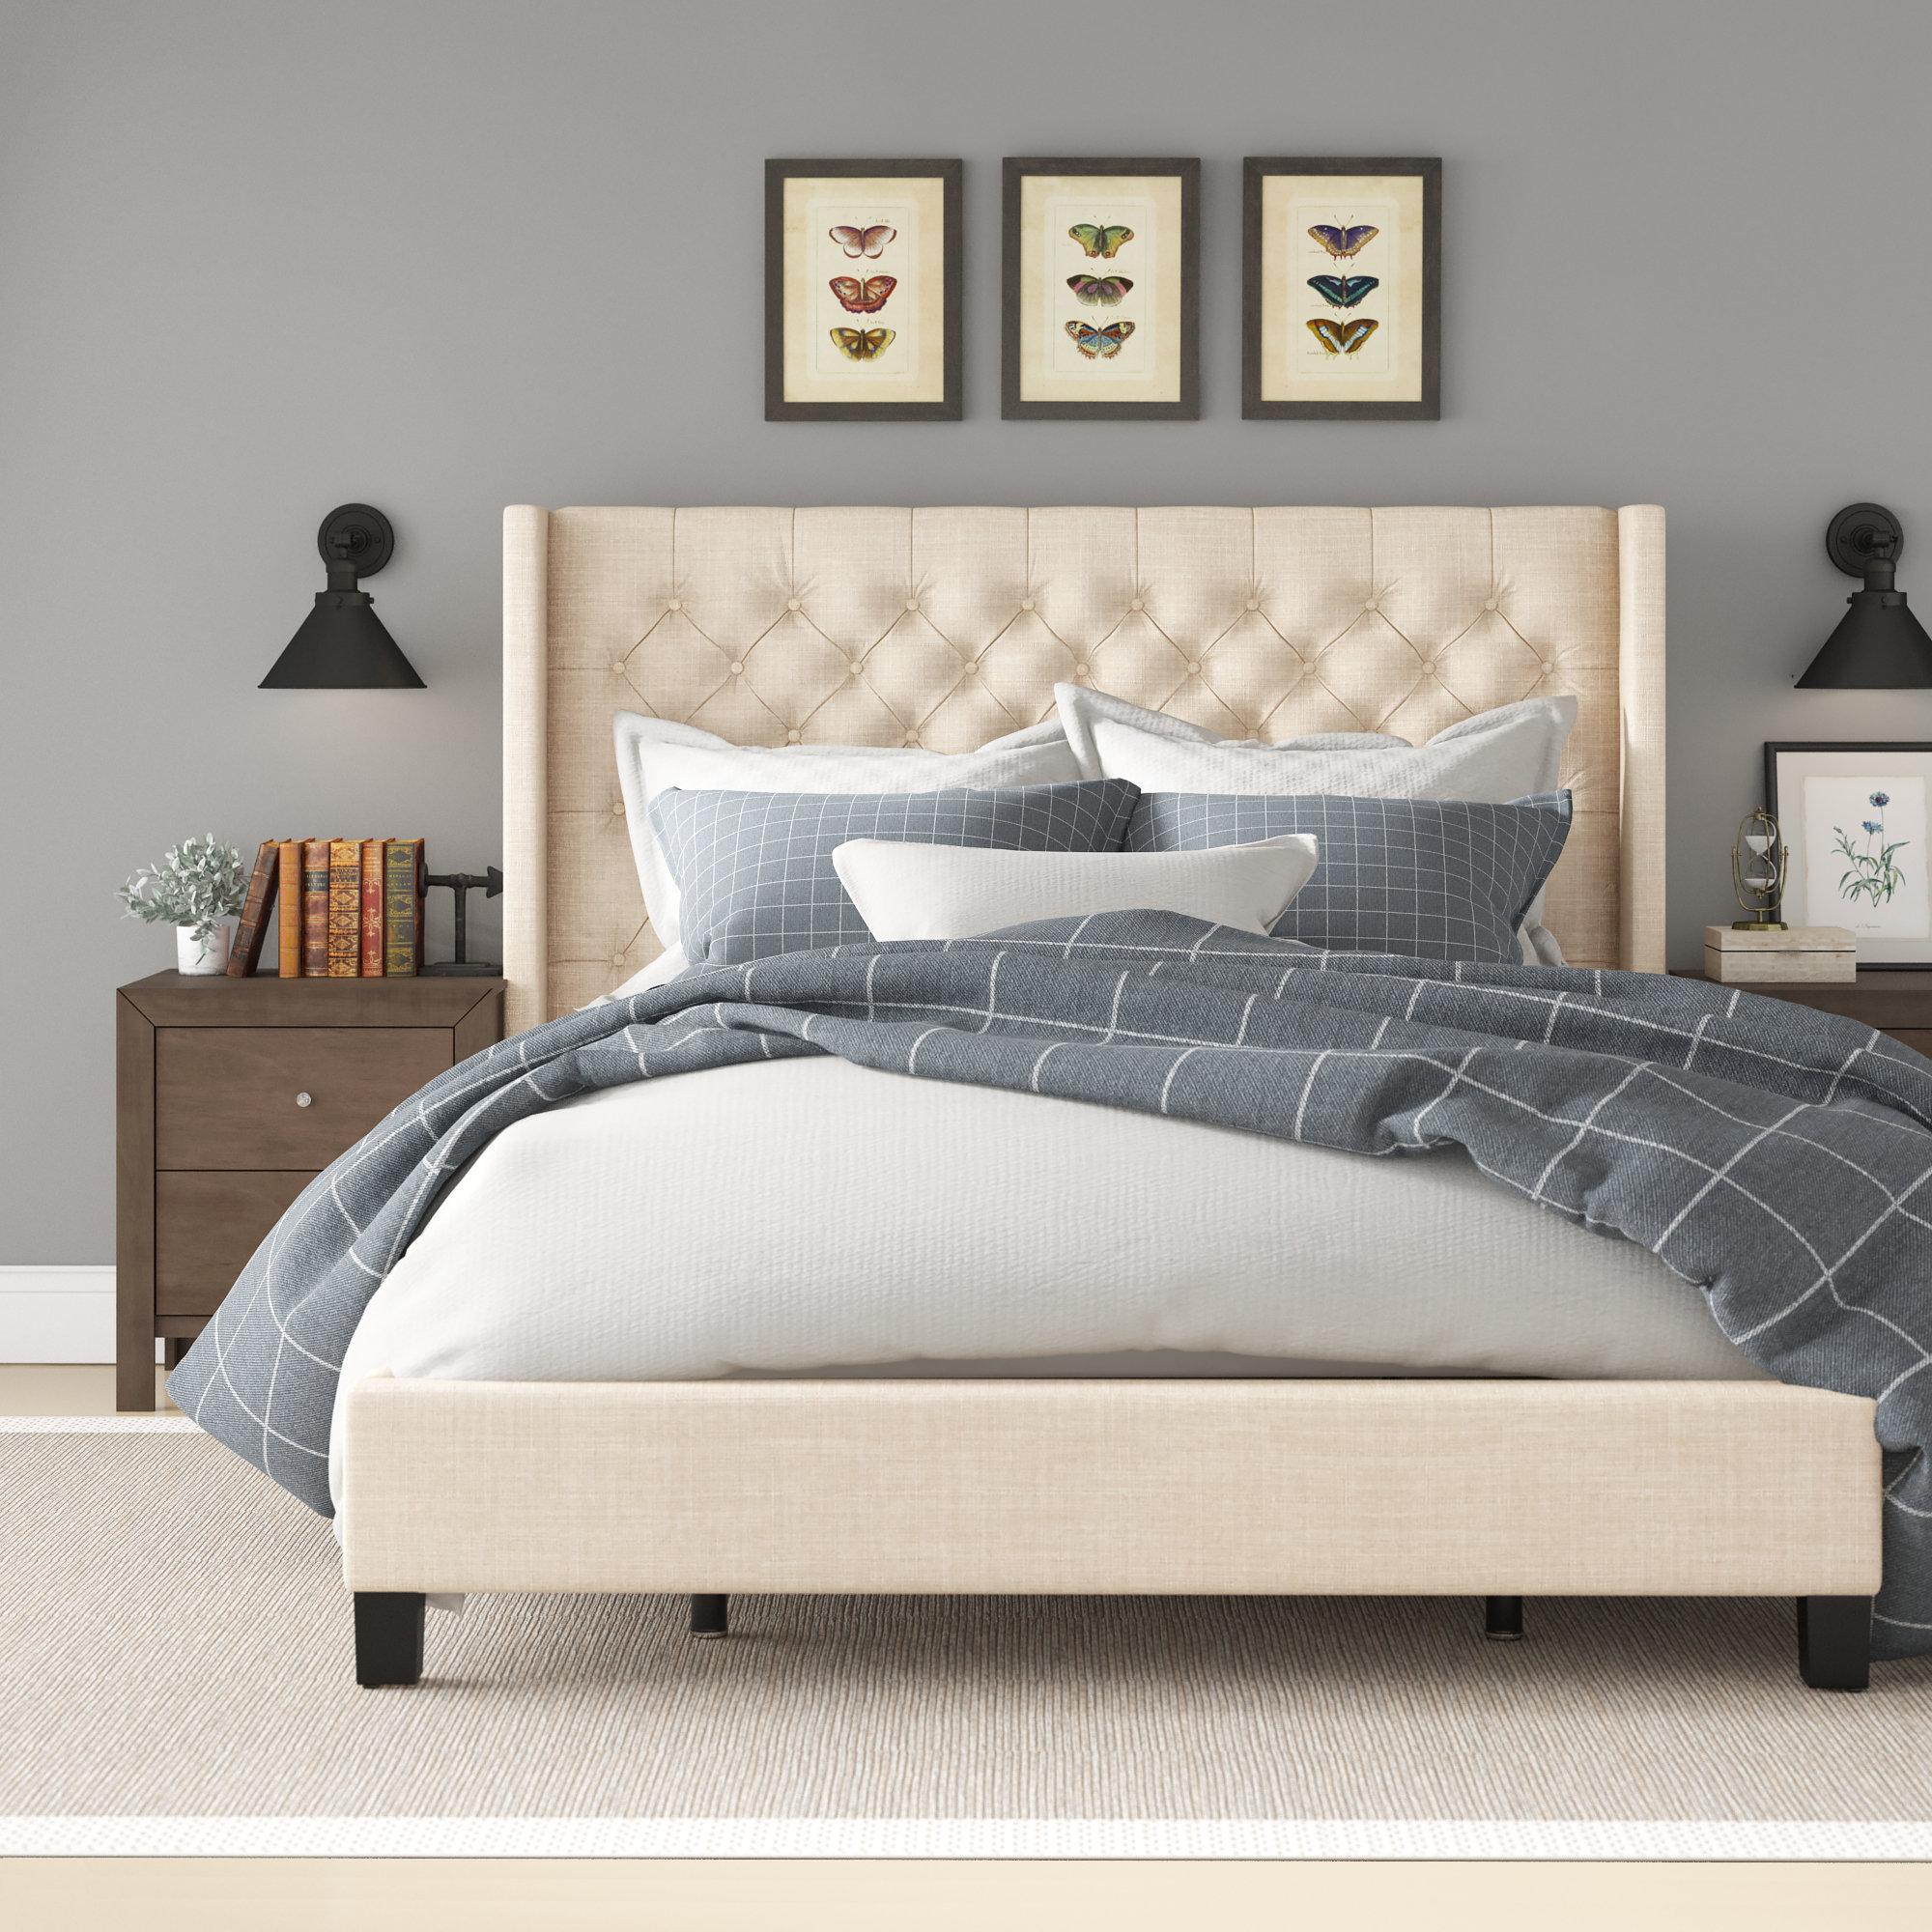 Wiggins Upholstered Low Profile Standard Bed Reviews Birch Lane